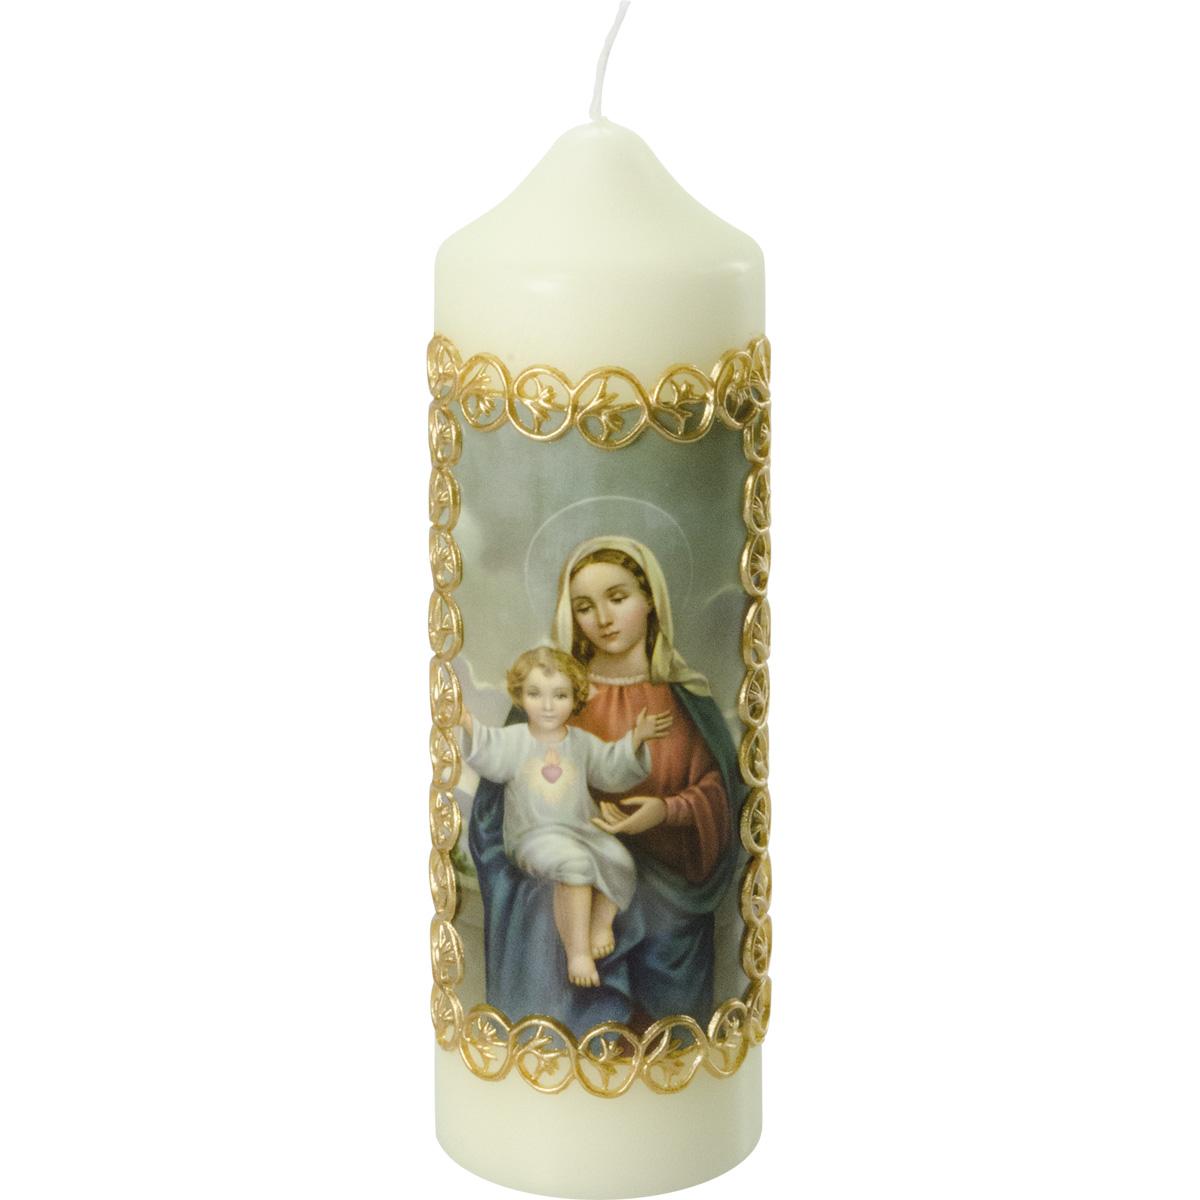 Liturgische Kerze / Marienkerze, 815-A, 165x50, Fotodruck